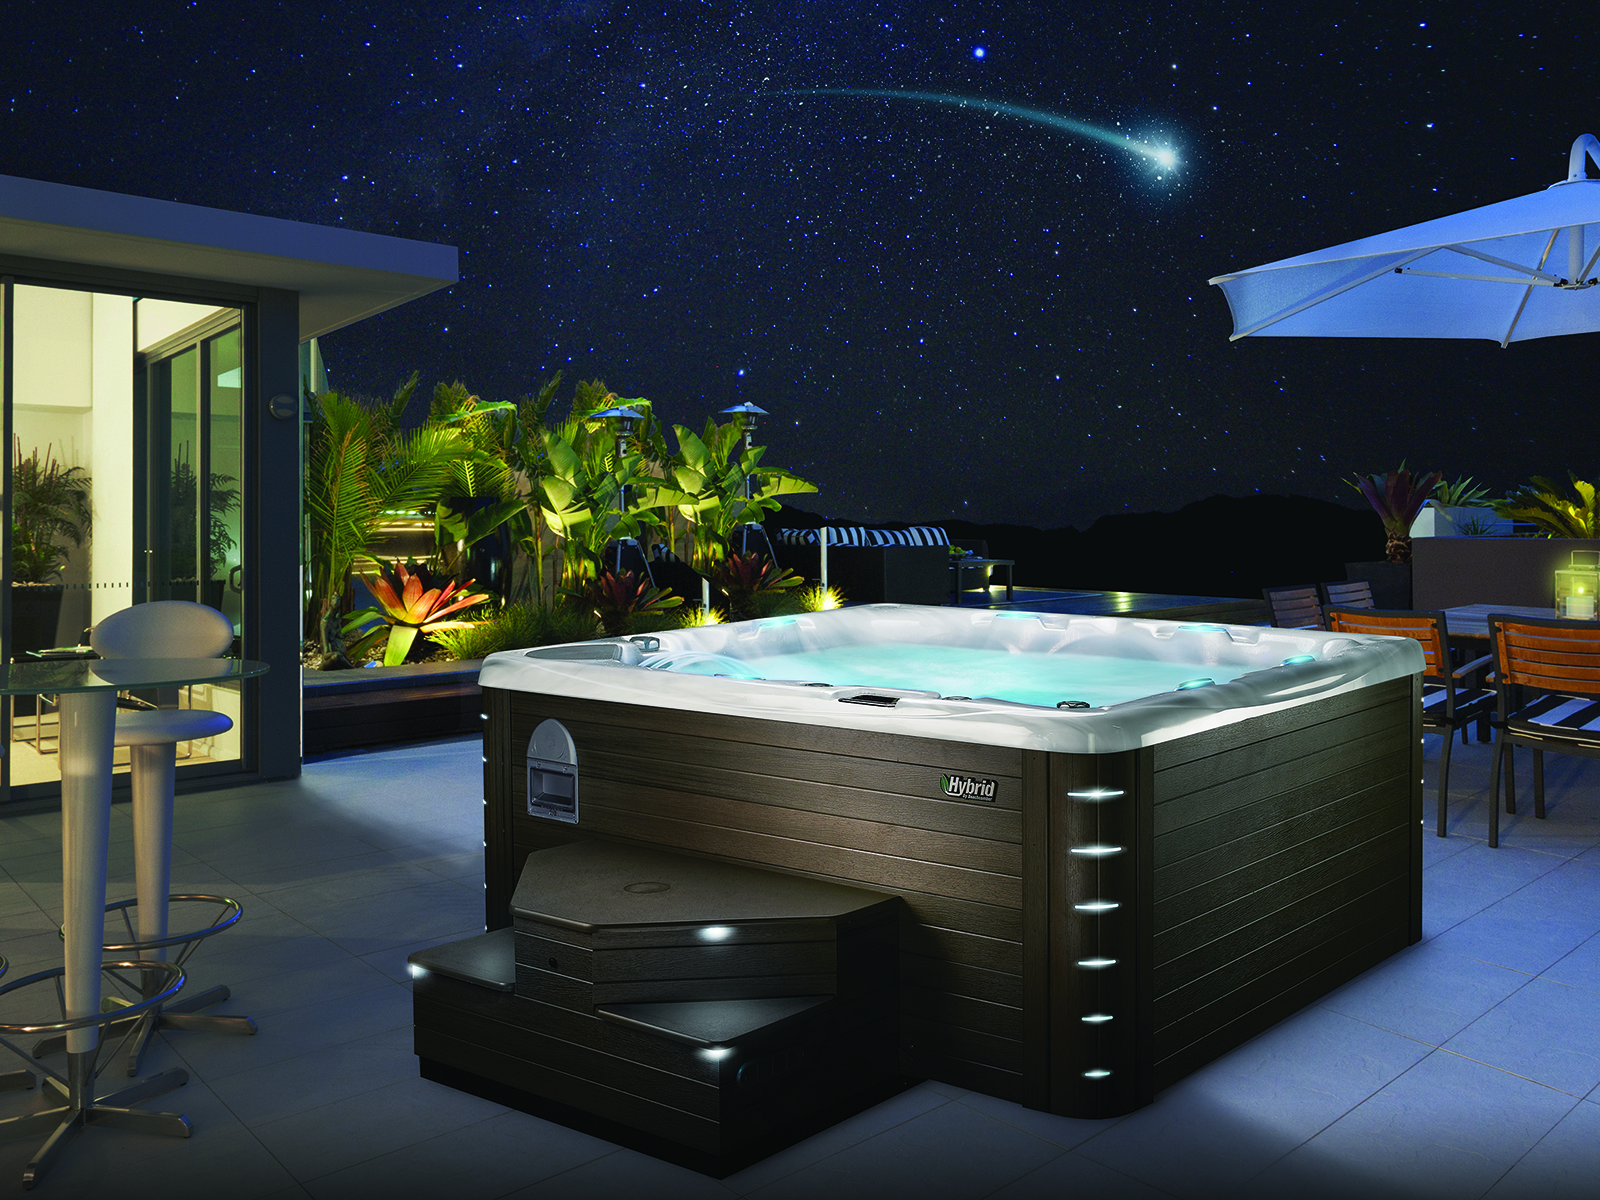 beachcomber hot tub at night lit up